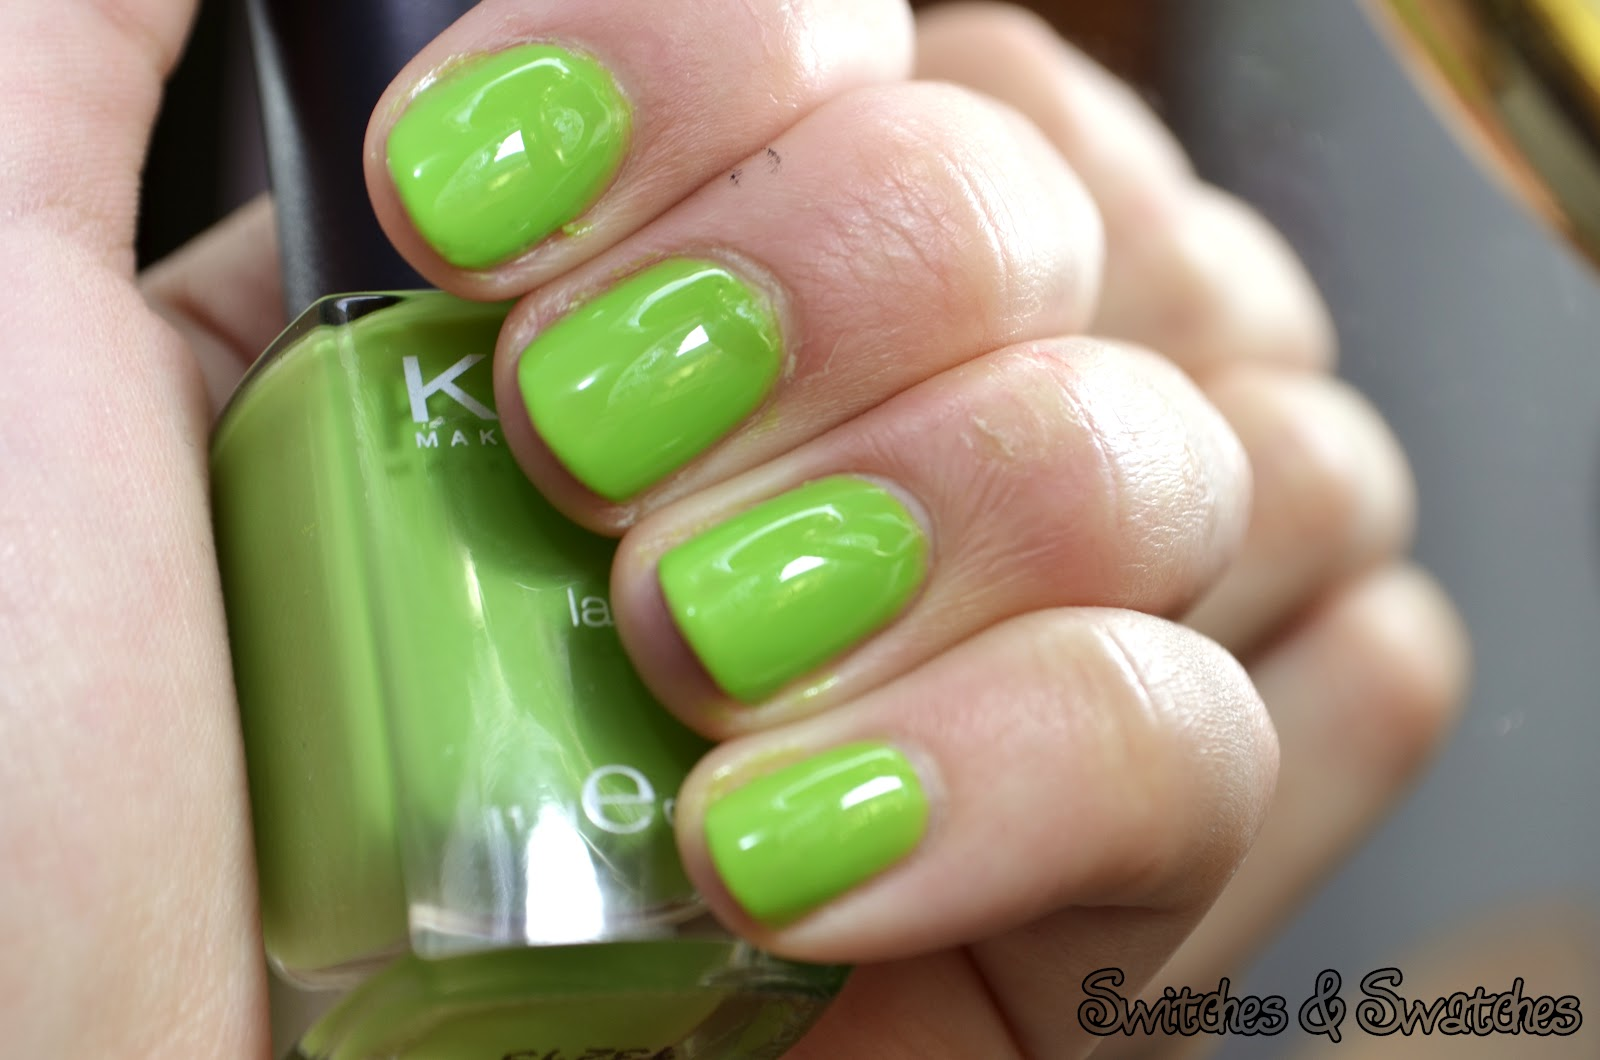 Switches & Swatches. Blog de belleza: uñas